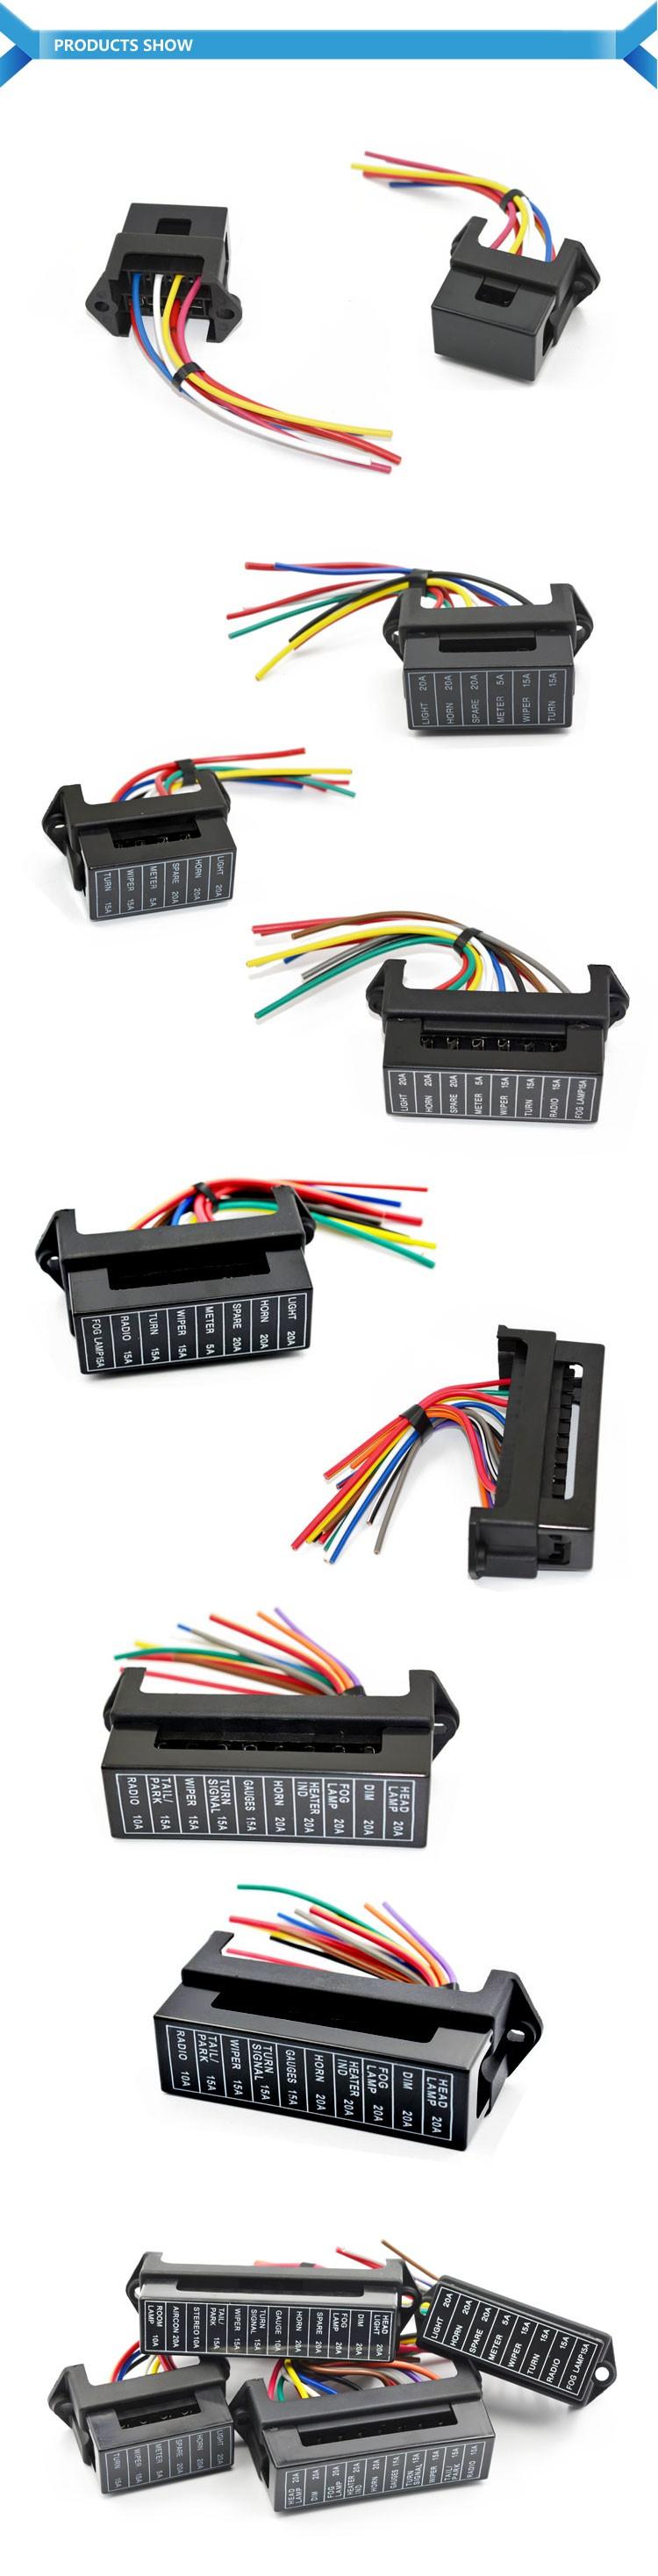 HTB1L_P4LFXXXXa.XVXXq6xXFXXXm auto fuse box universal,fuse box relay control module oem,12v fuse 12v fuse box at bakdesigns.co